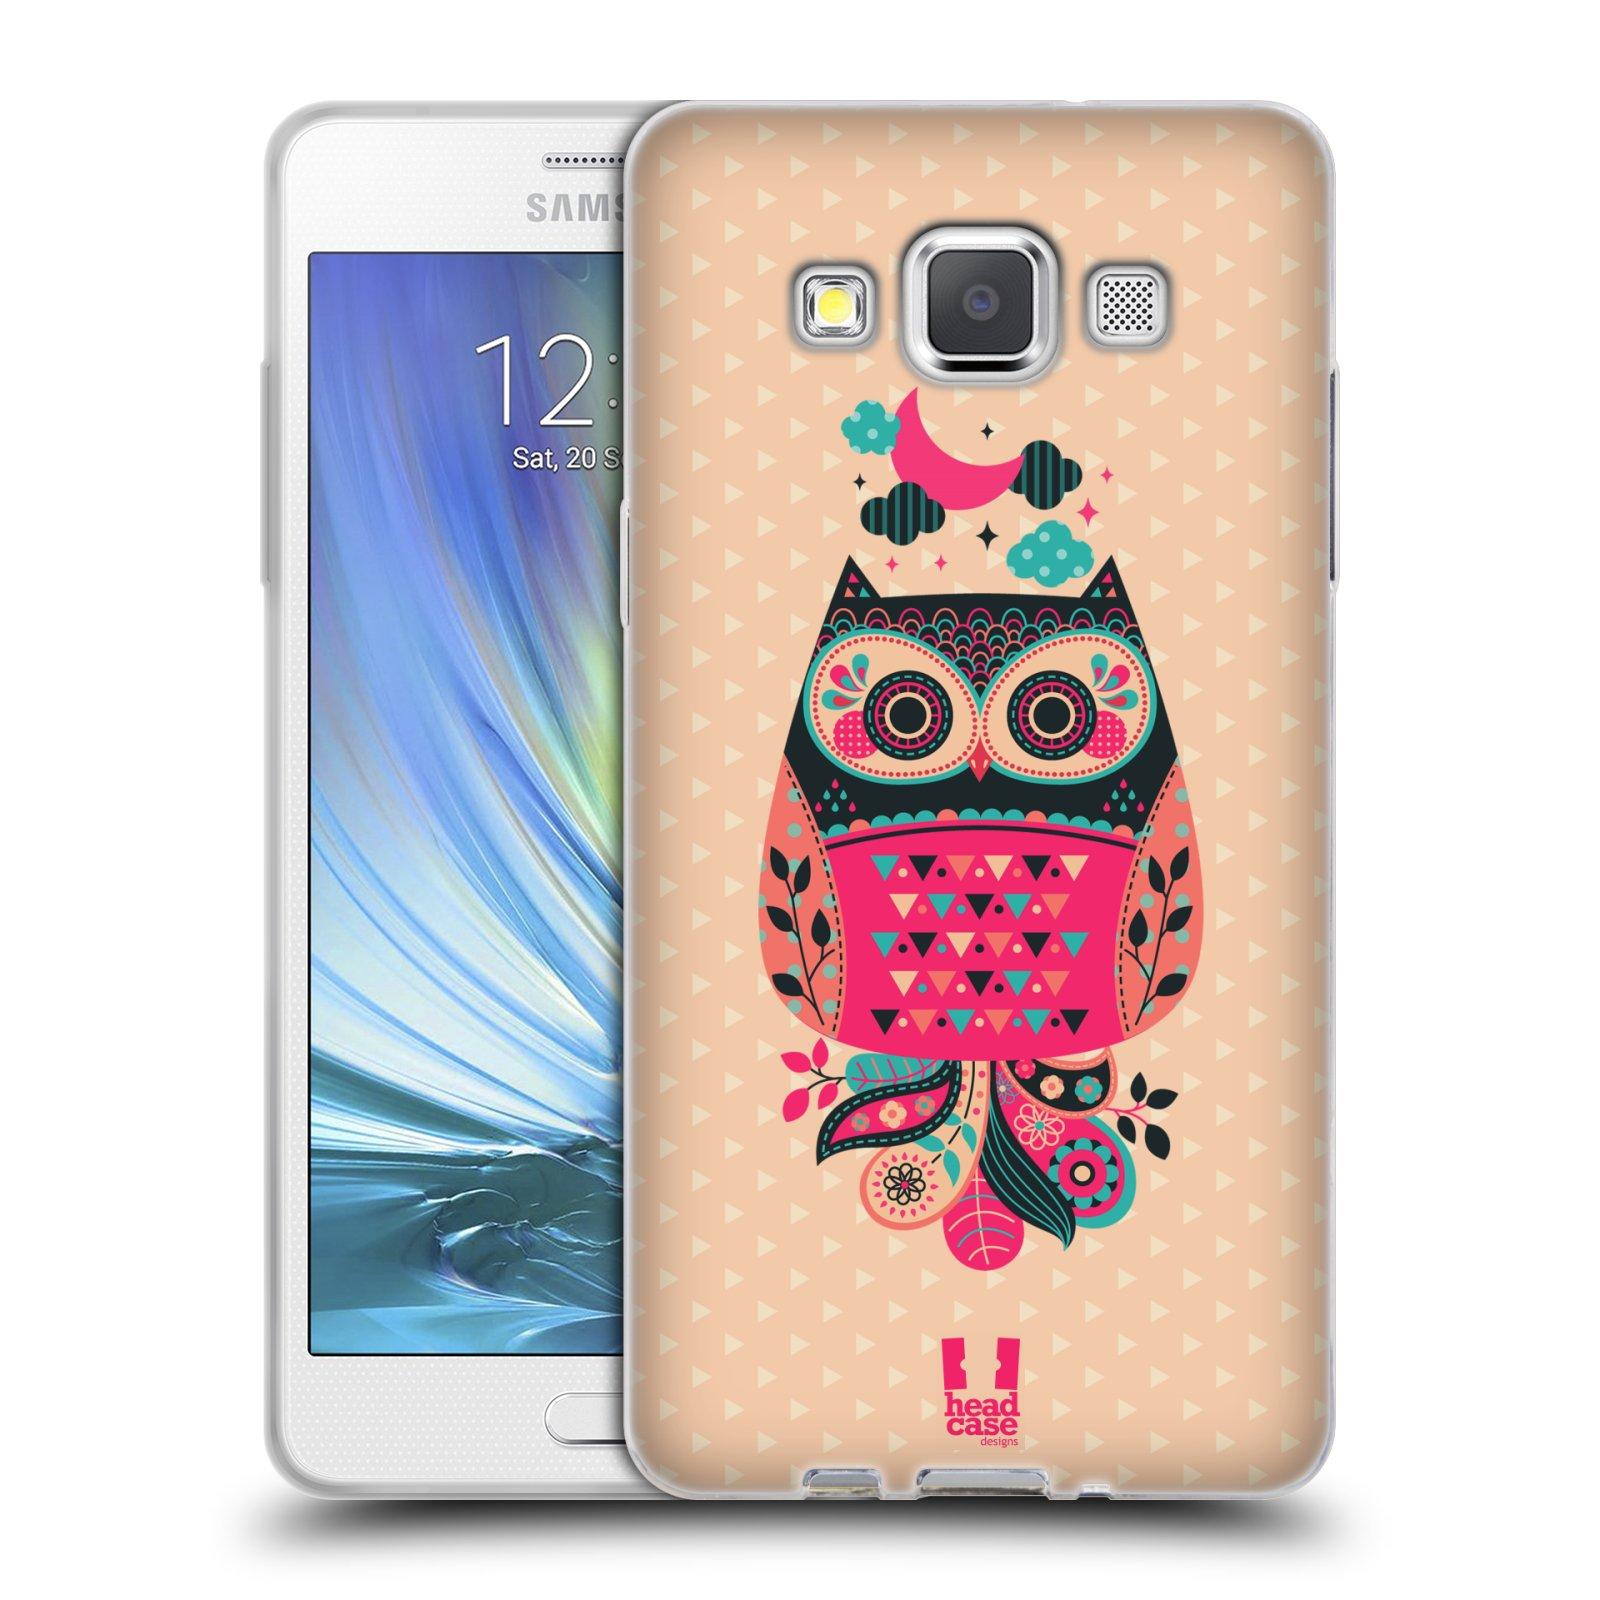 HEAD CASE silikonový obal na mobil Samsung Galaxy A5 vzor Stmívání sovička černá a korálová